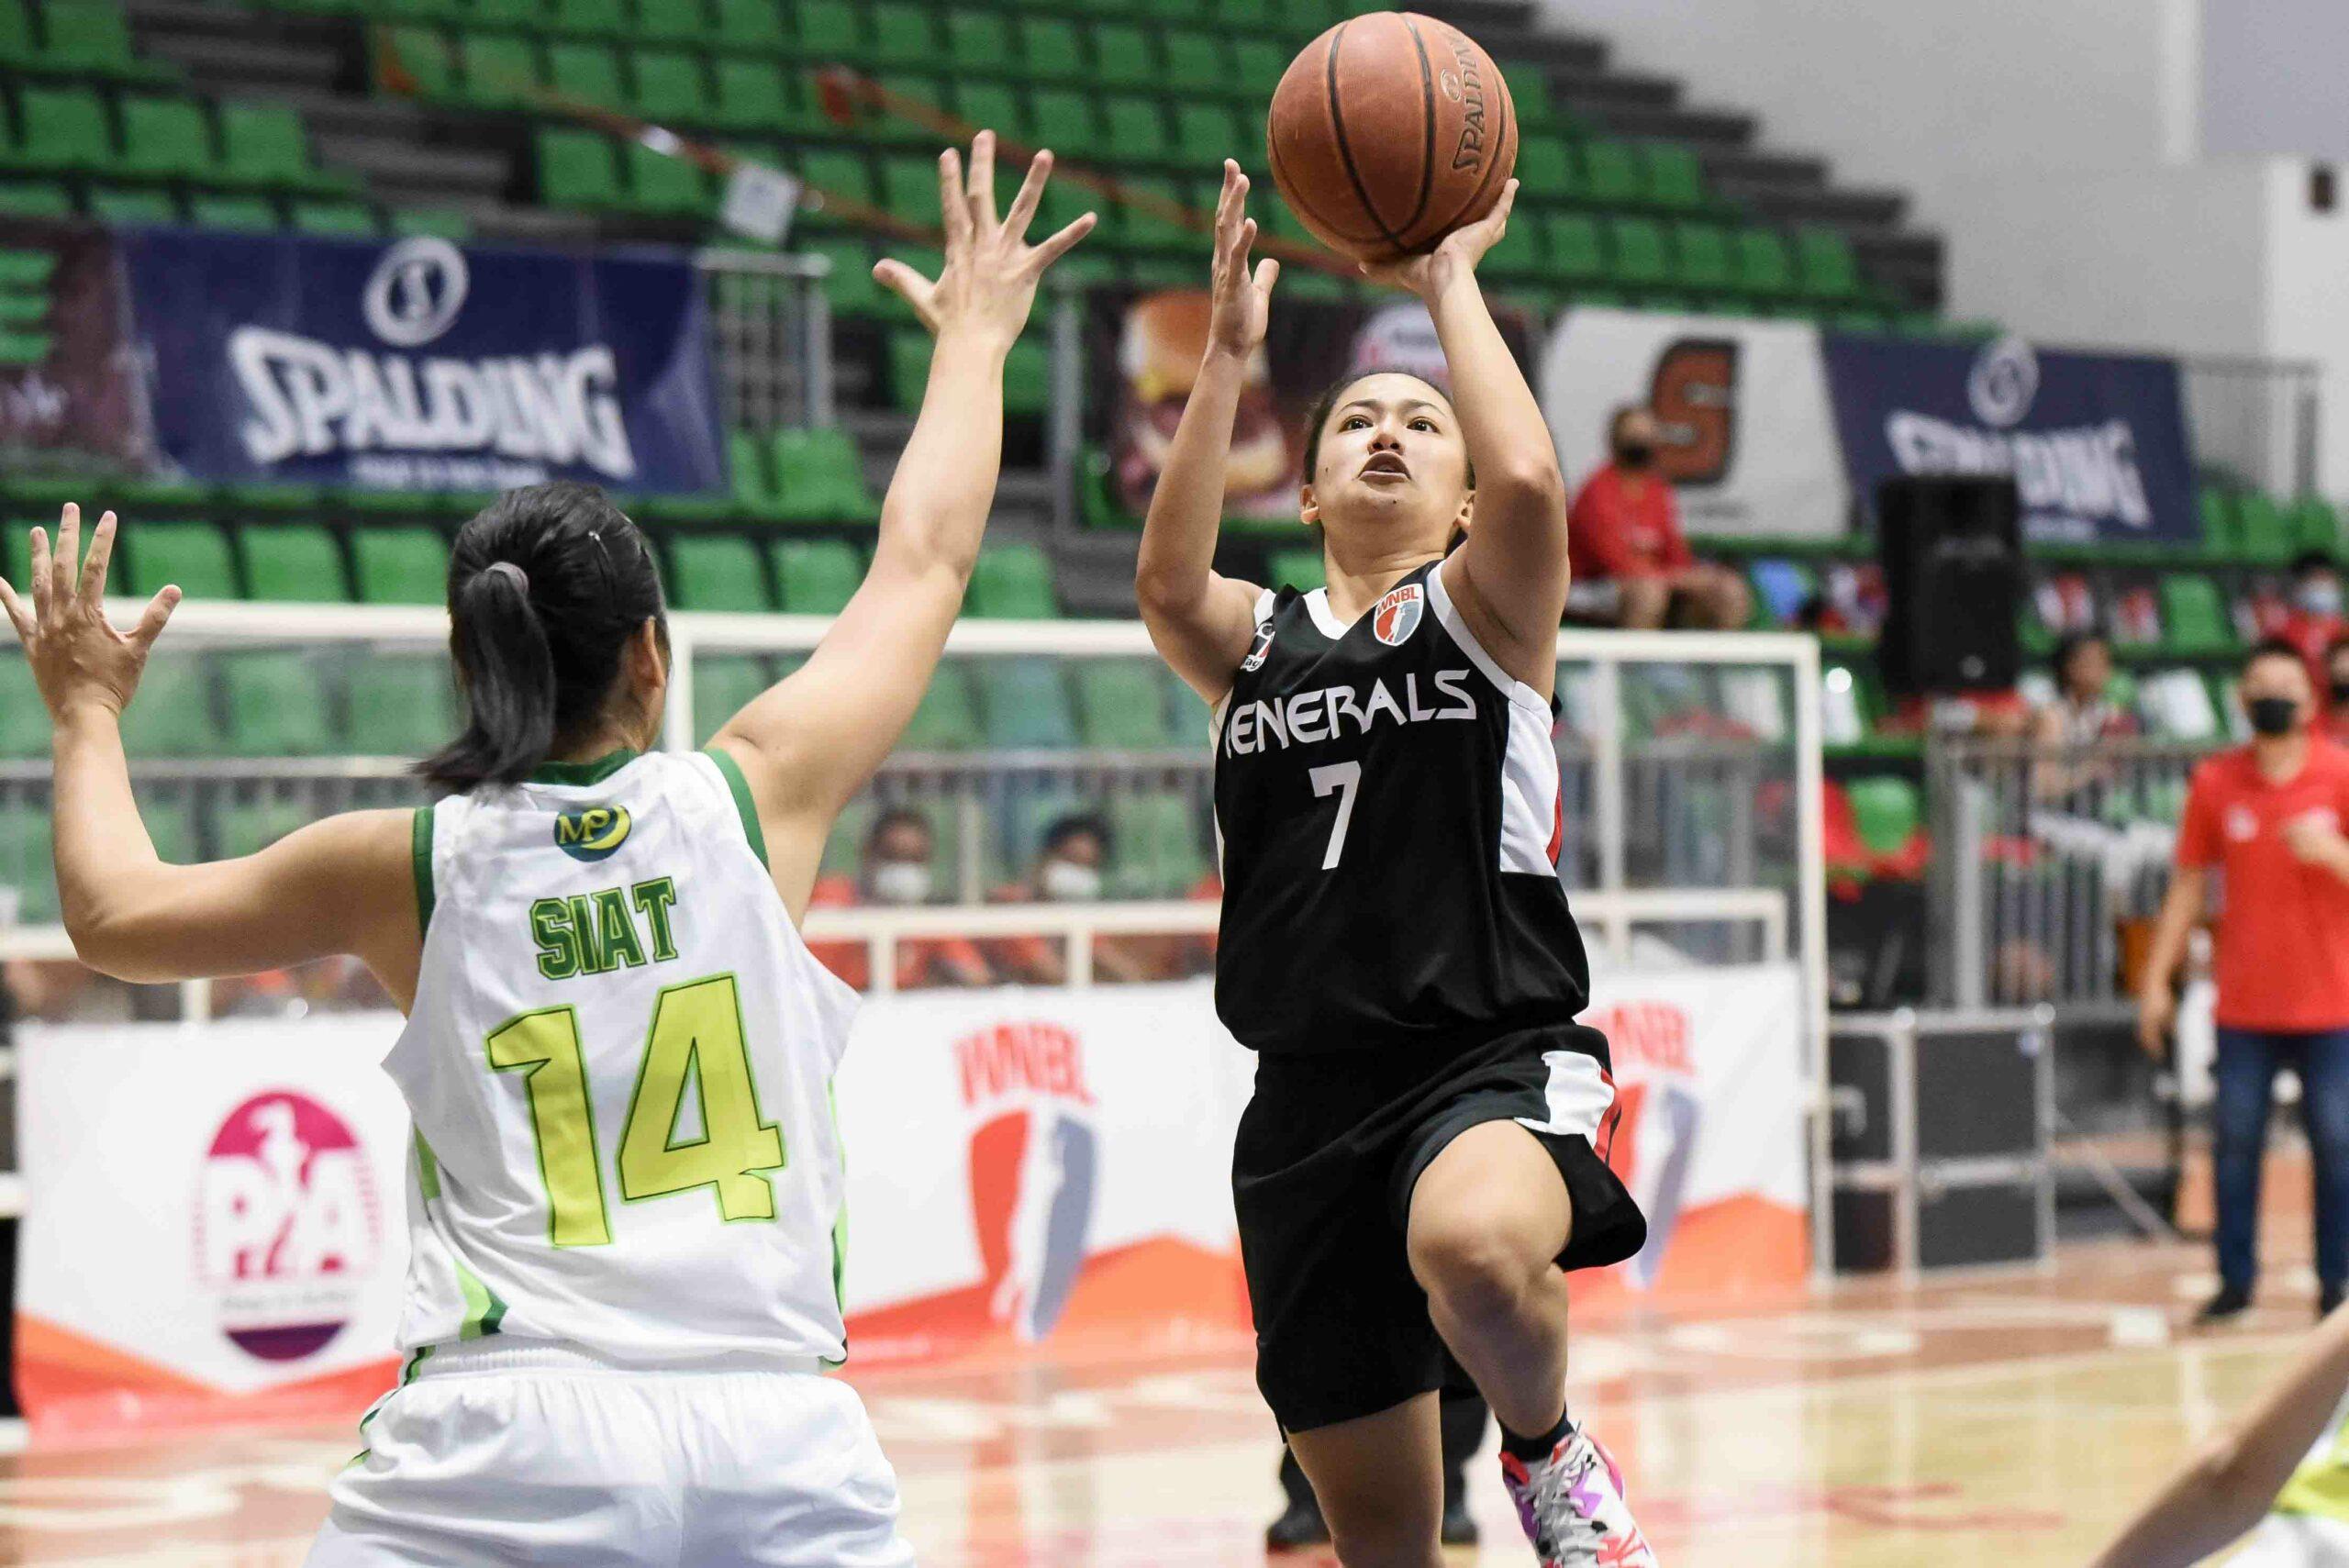 2021-pia-wnbl-paranaque-vs-taguig-janeth-sison-scaled Allana Lim dominates, tows Parañaque past Taguig in WNBL Basketball NBL News  - philippine sports news